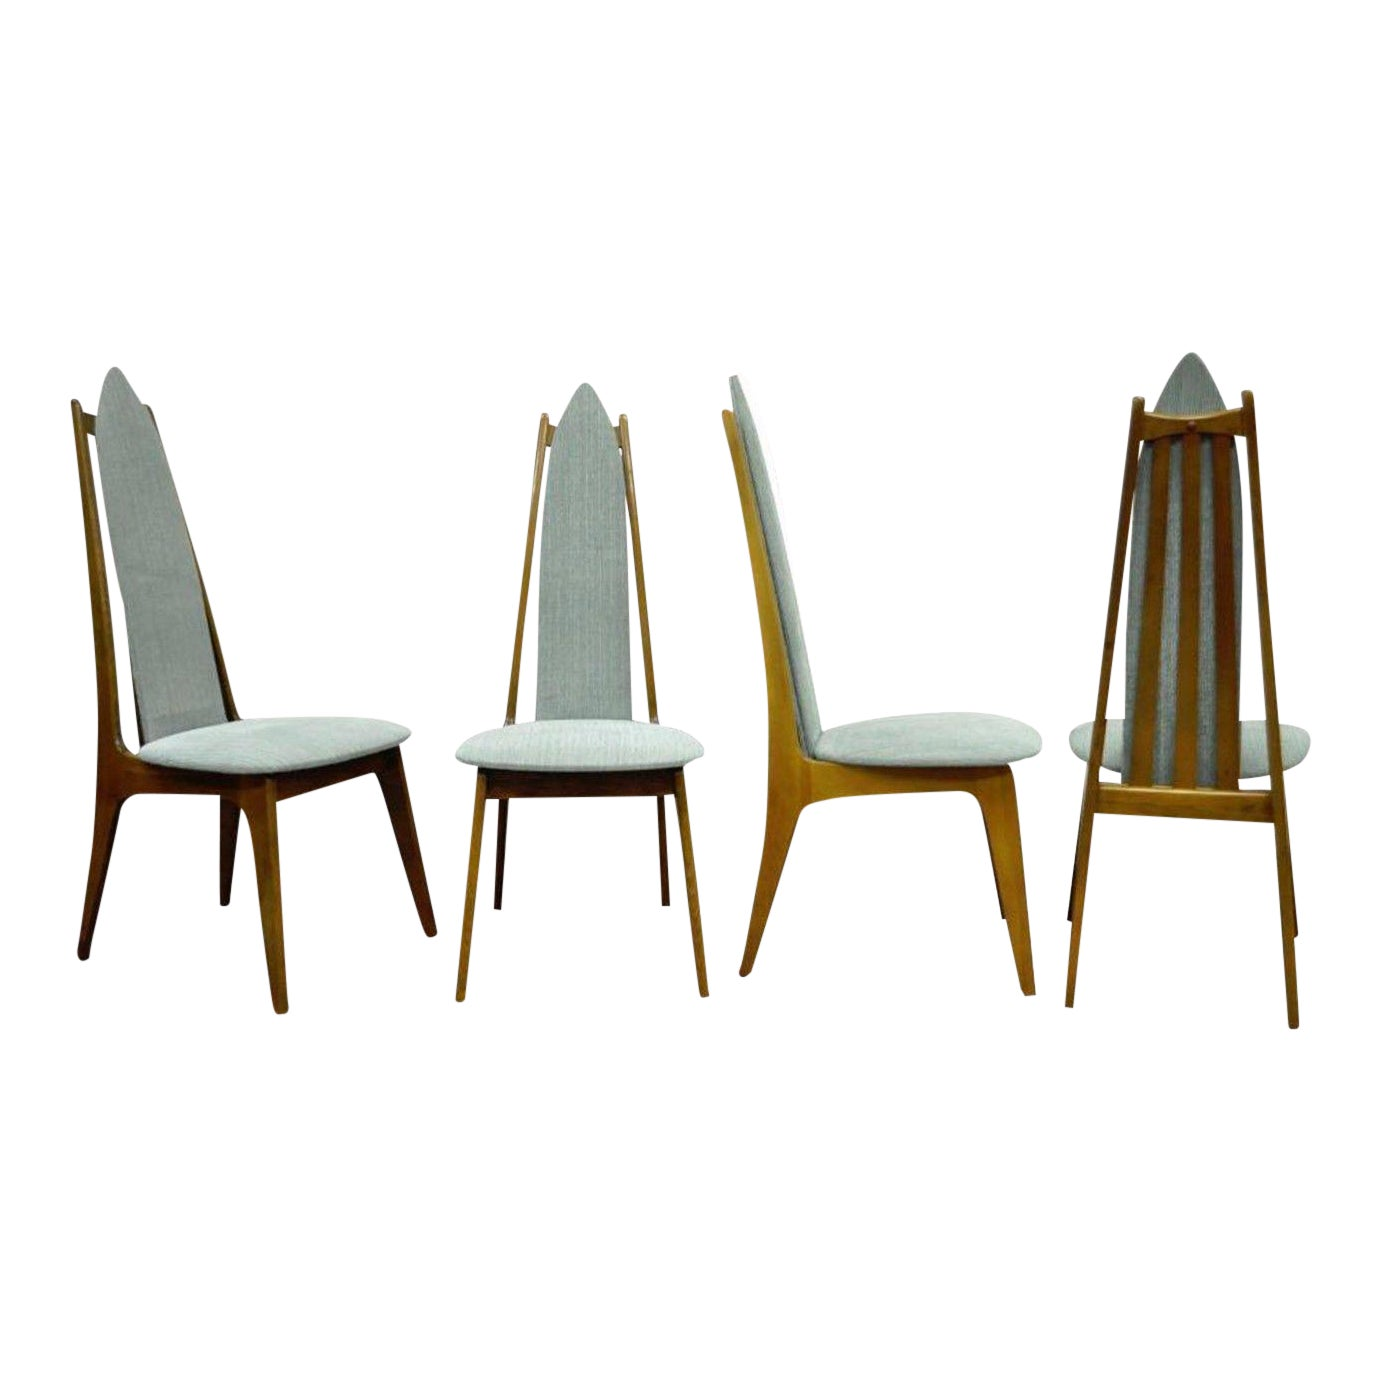 Set Of 4 Vintage Mid Century Modern Sculptural Walnut Dining Chairs